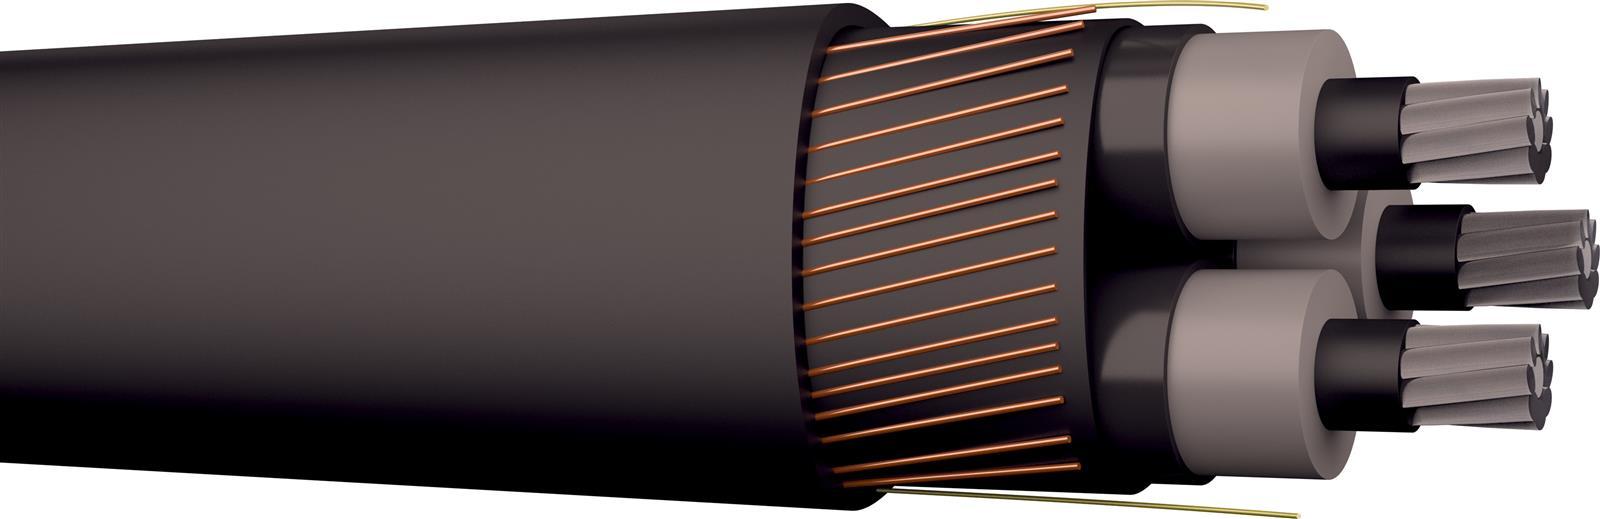 AXQJ-RMF PURE 3X50/16 24KV T5